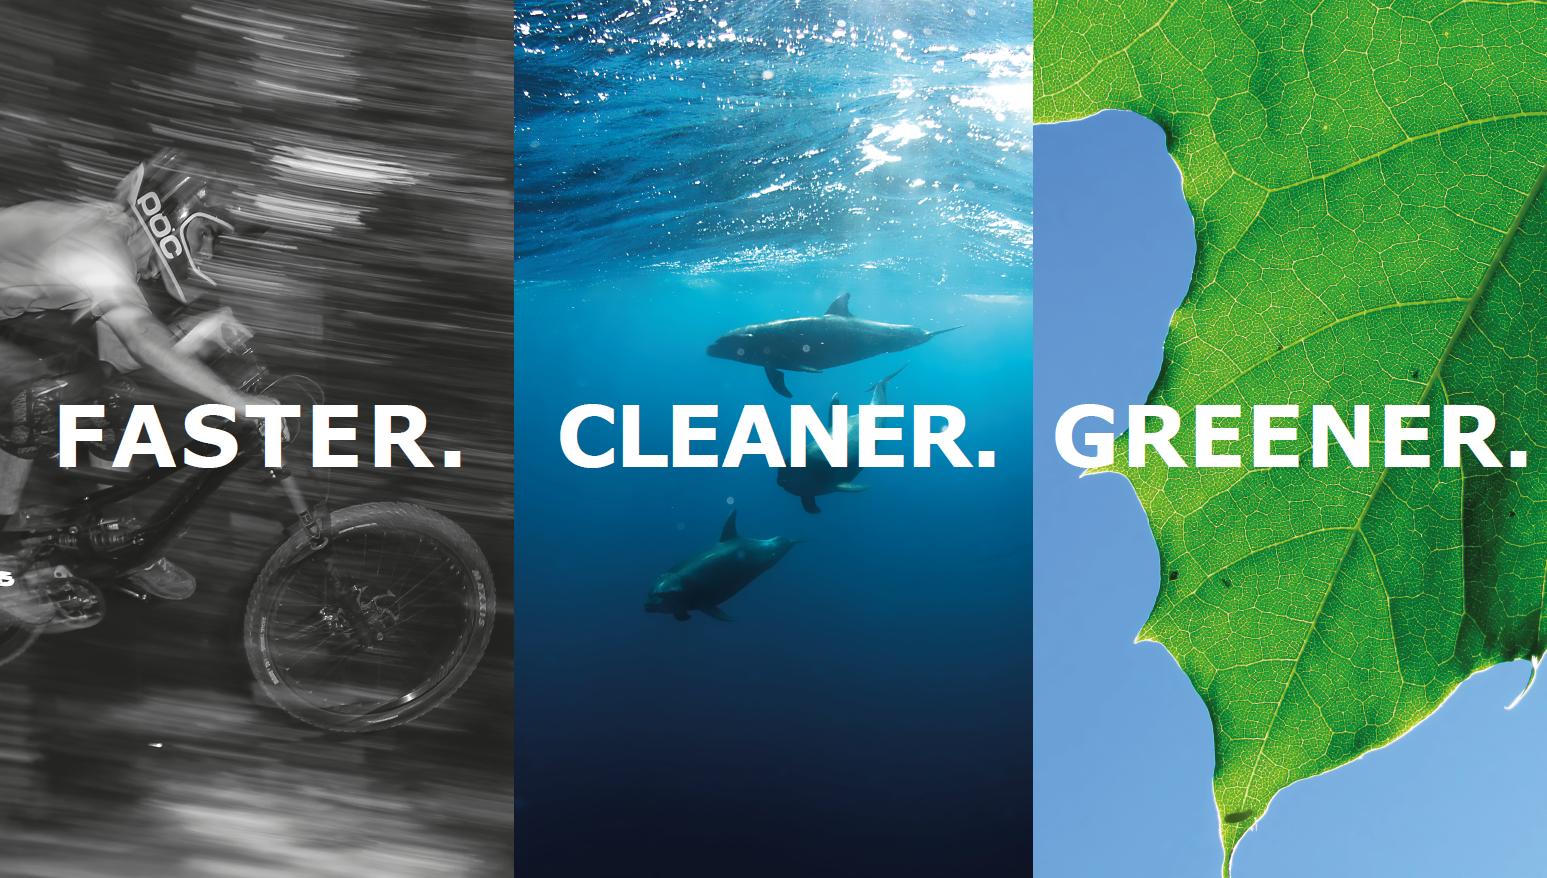 Faster_Cleaner_Greener.png